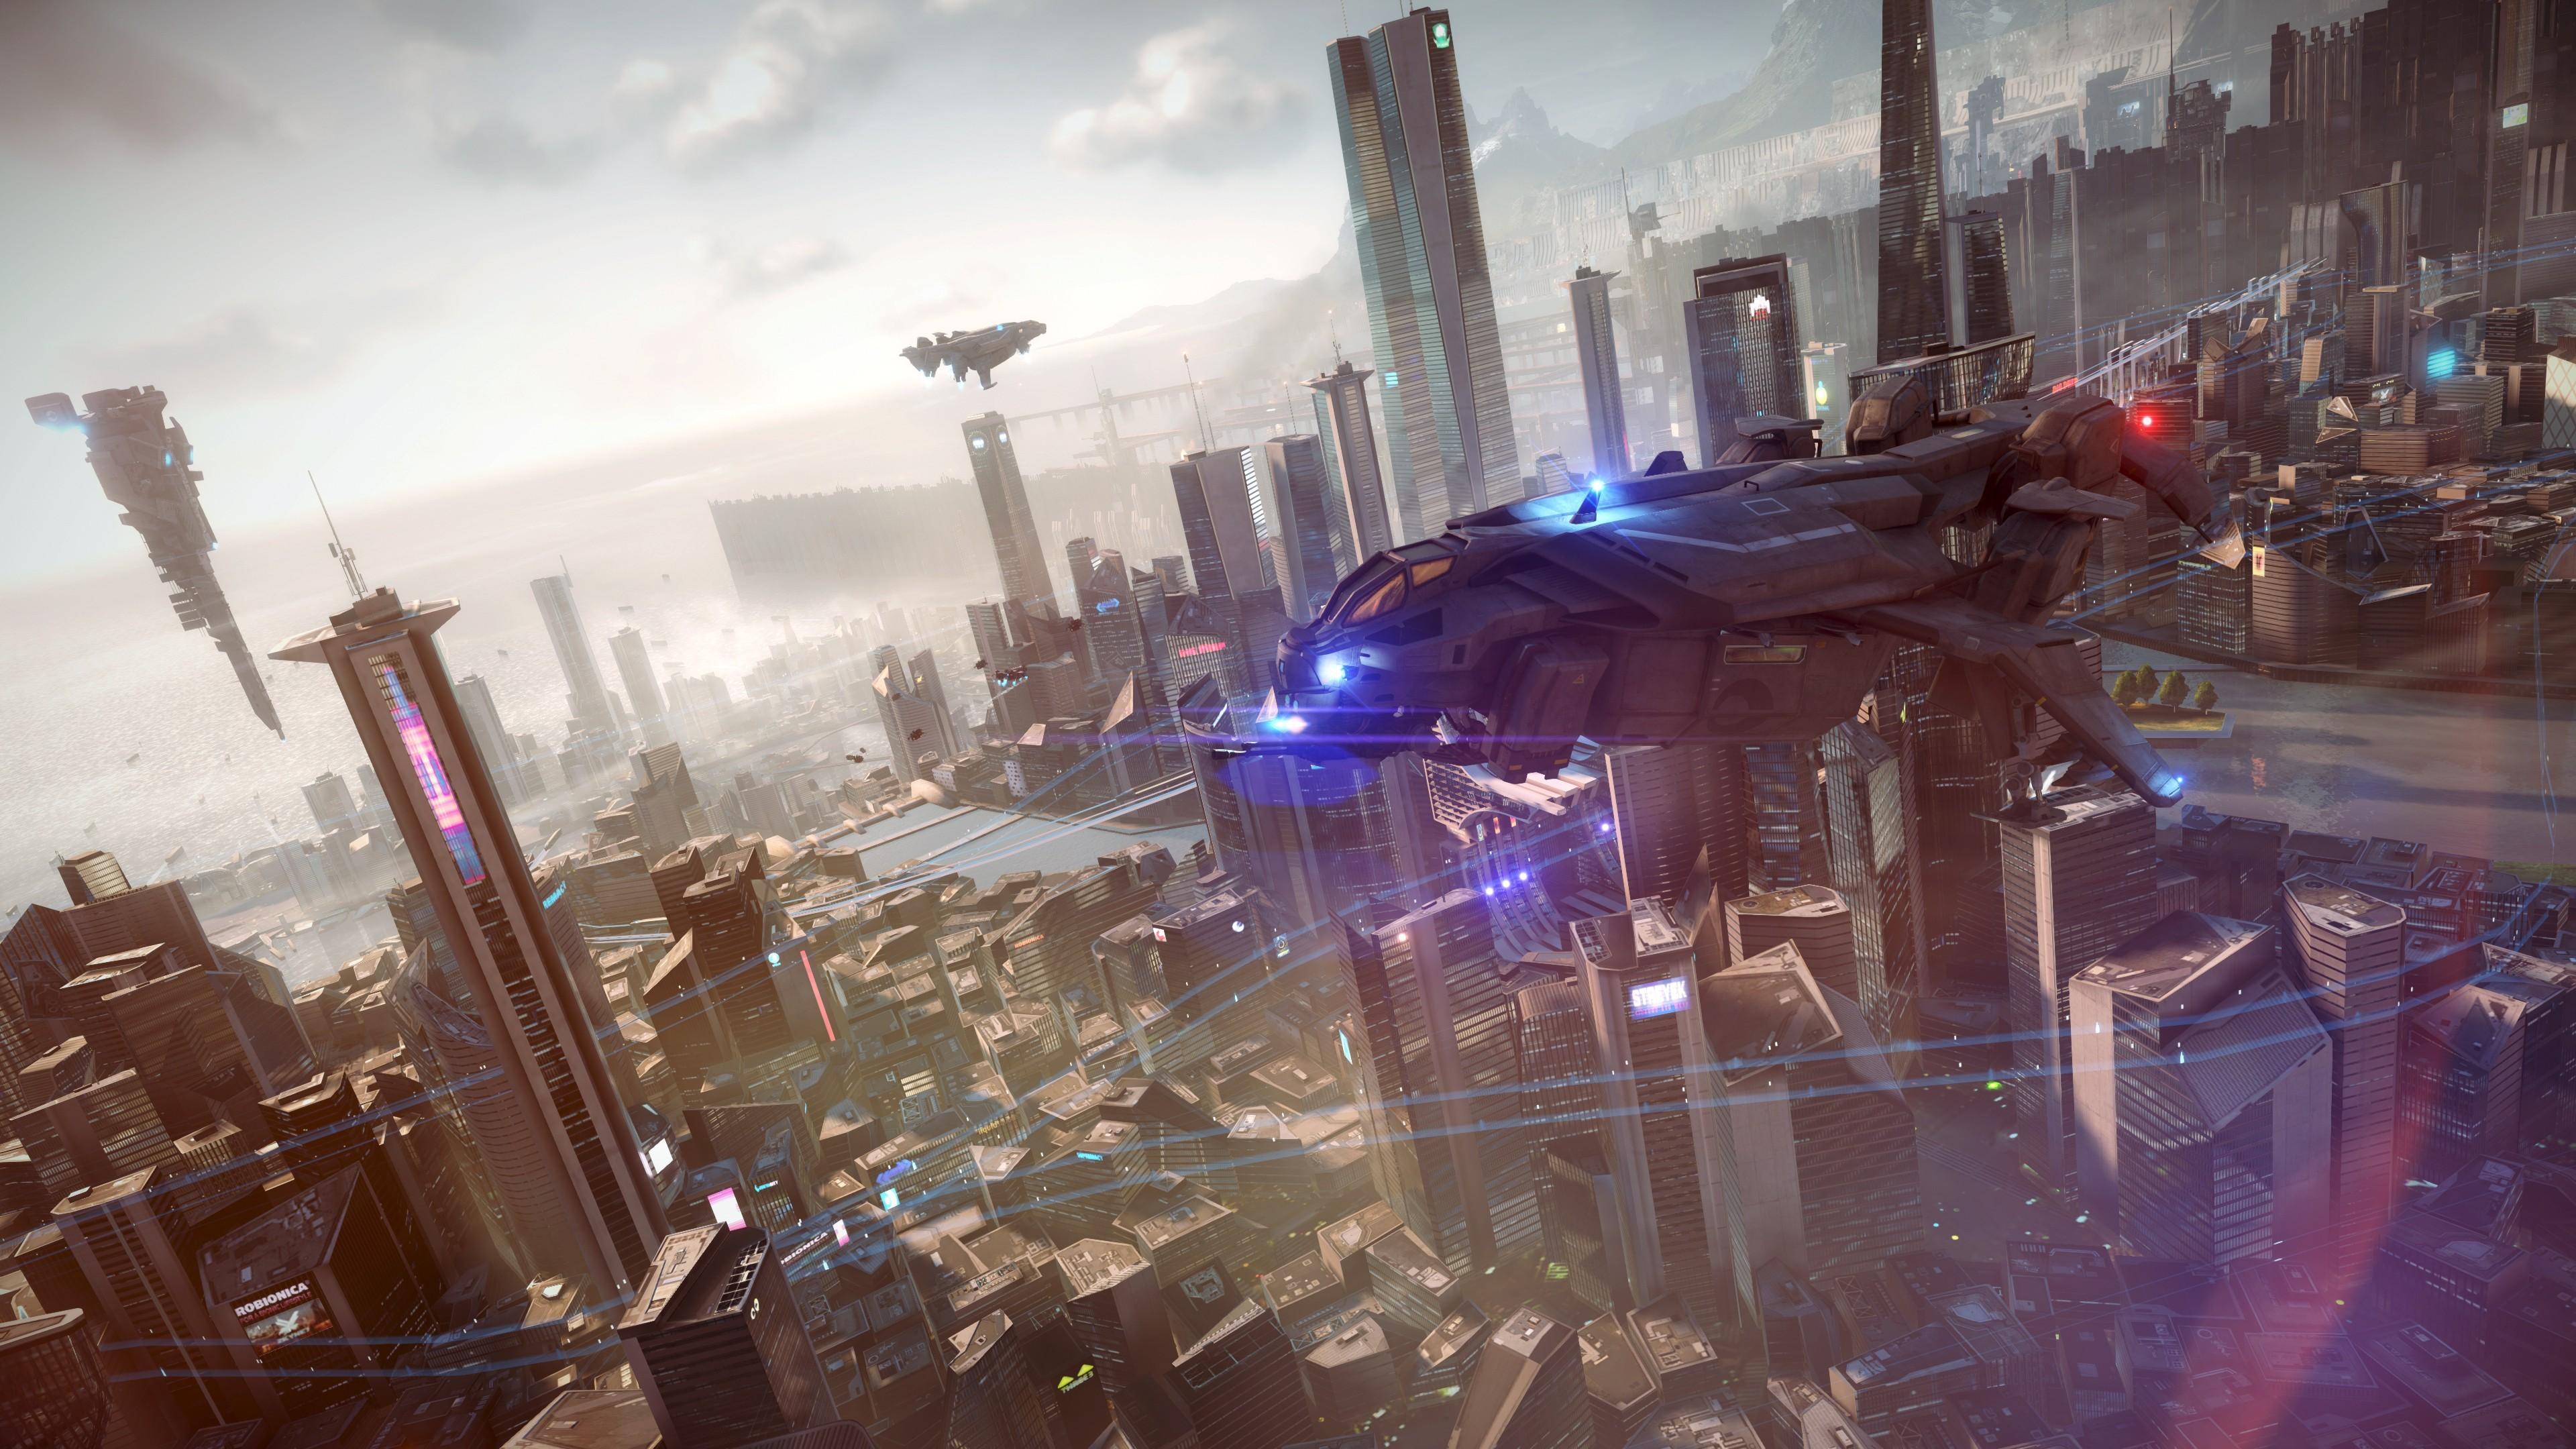 General 3840x2160 artwork digital art spaceship city futuristic Killzone: Shadow Fall video games futuristic city